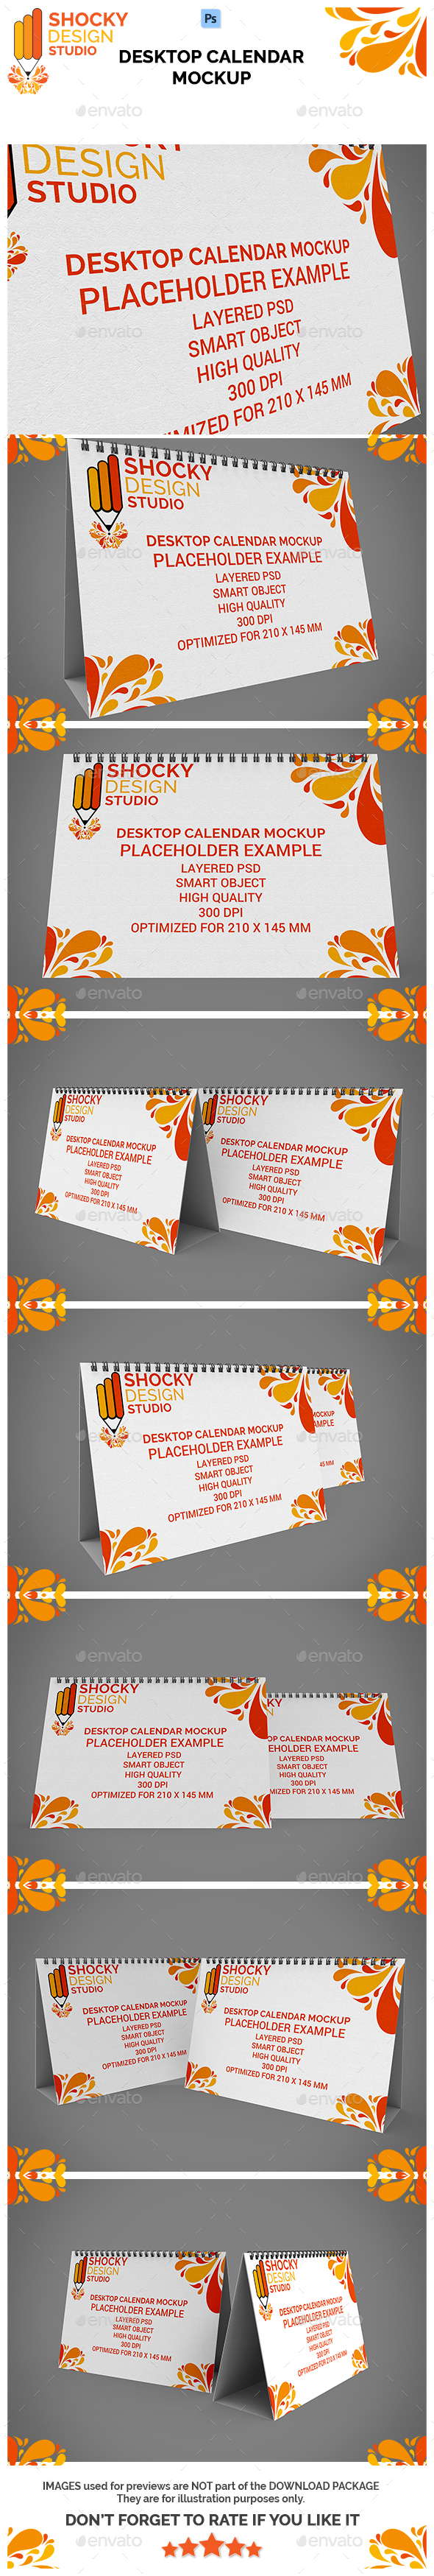 Desktop Calendar Mockup - Print Product Mock-Ups